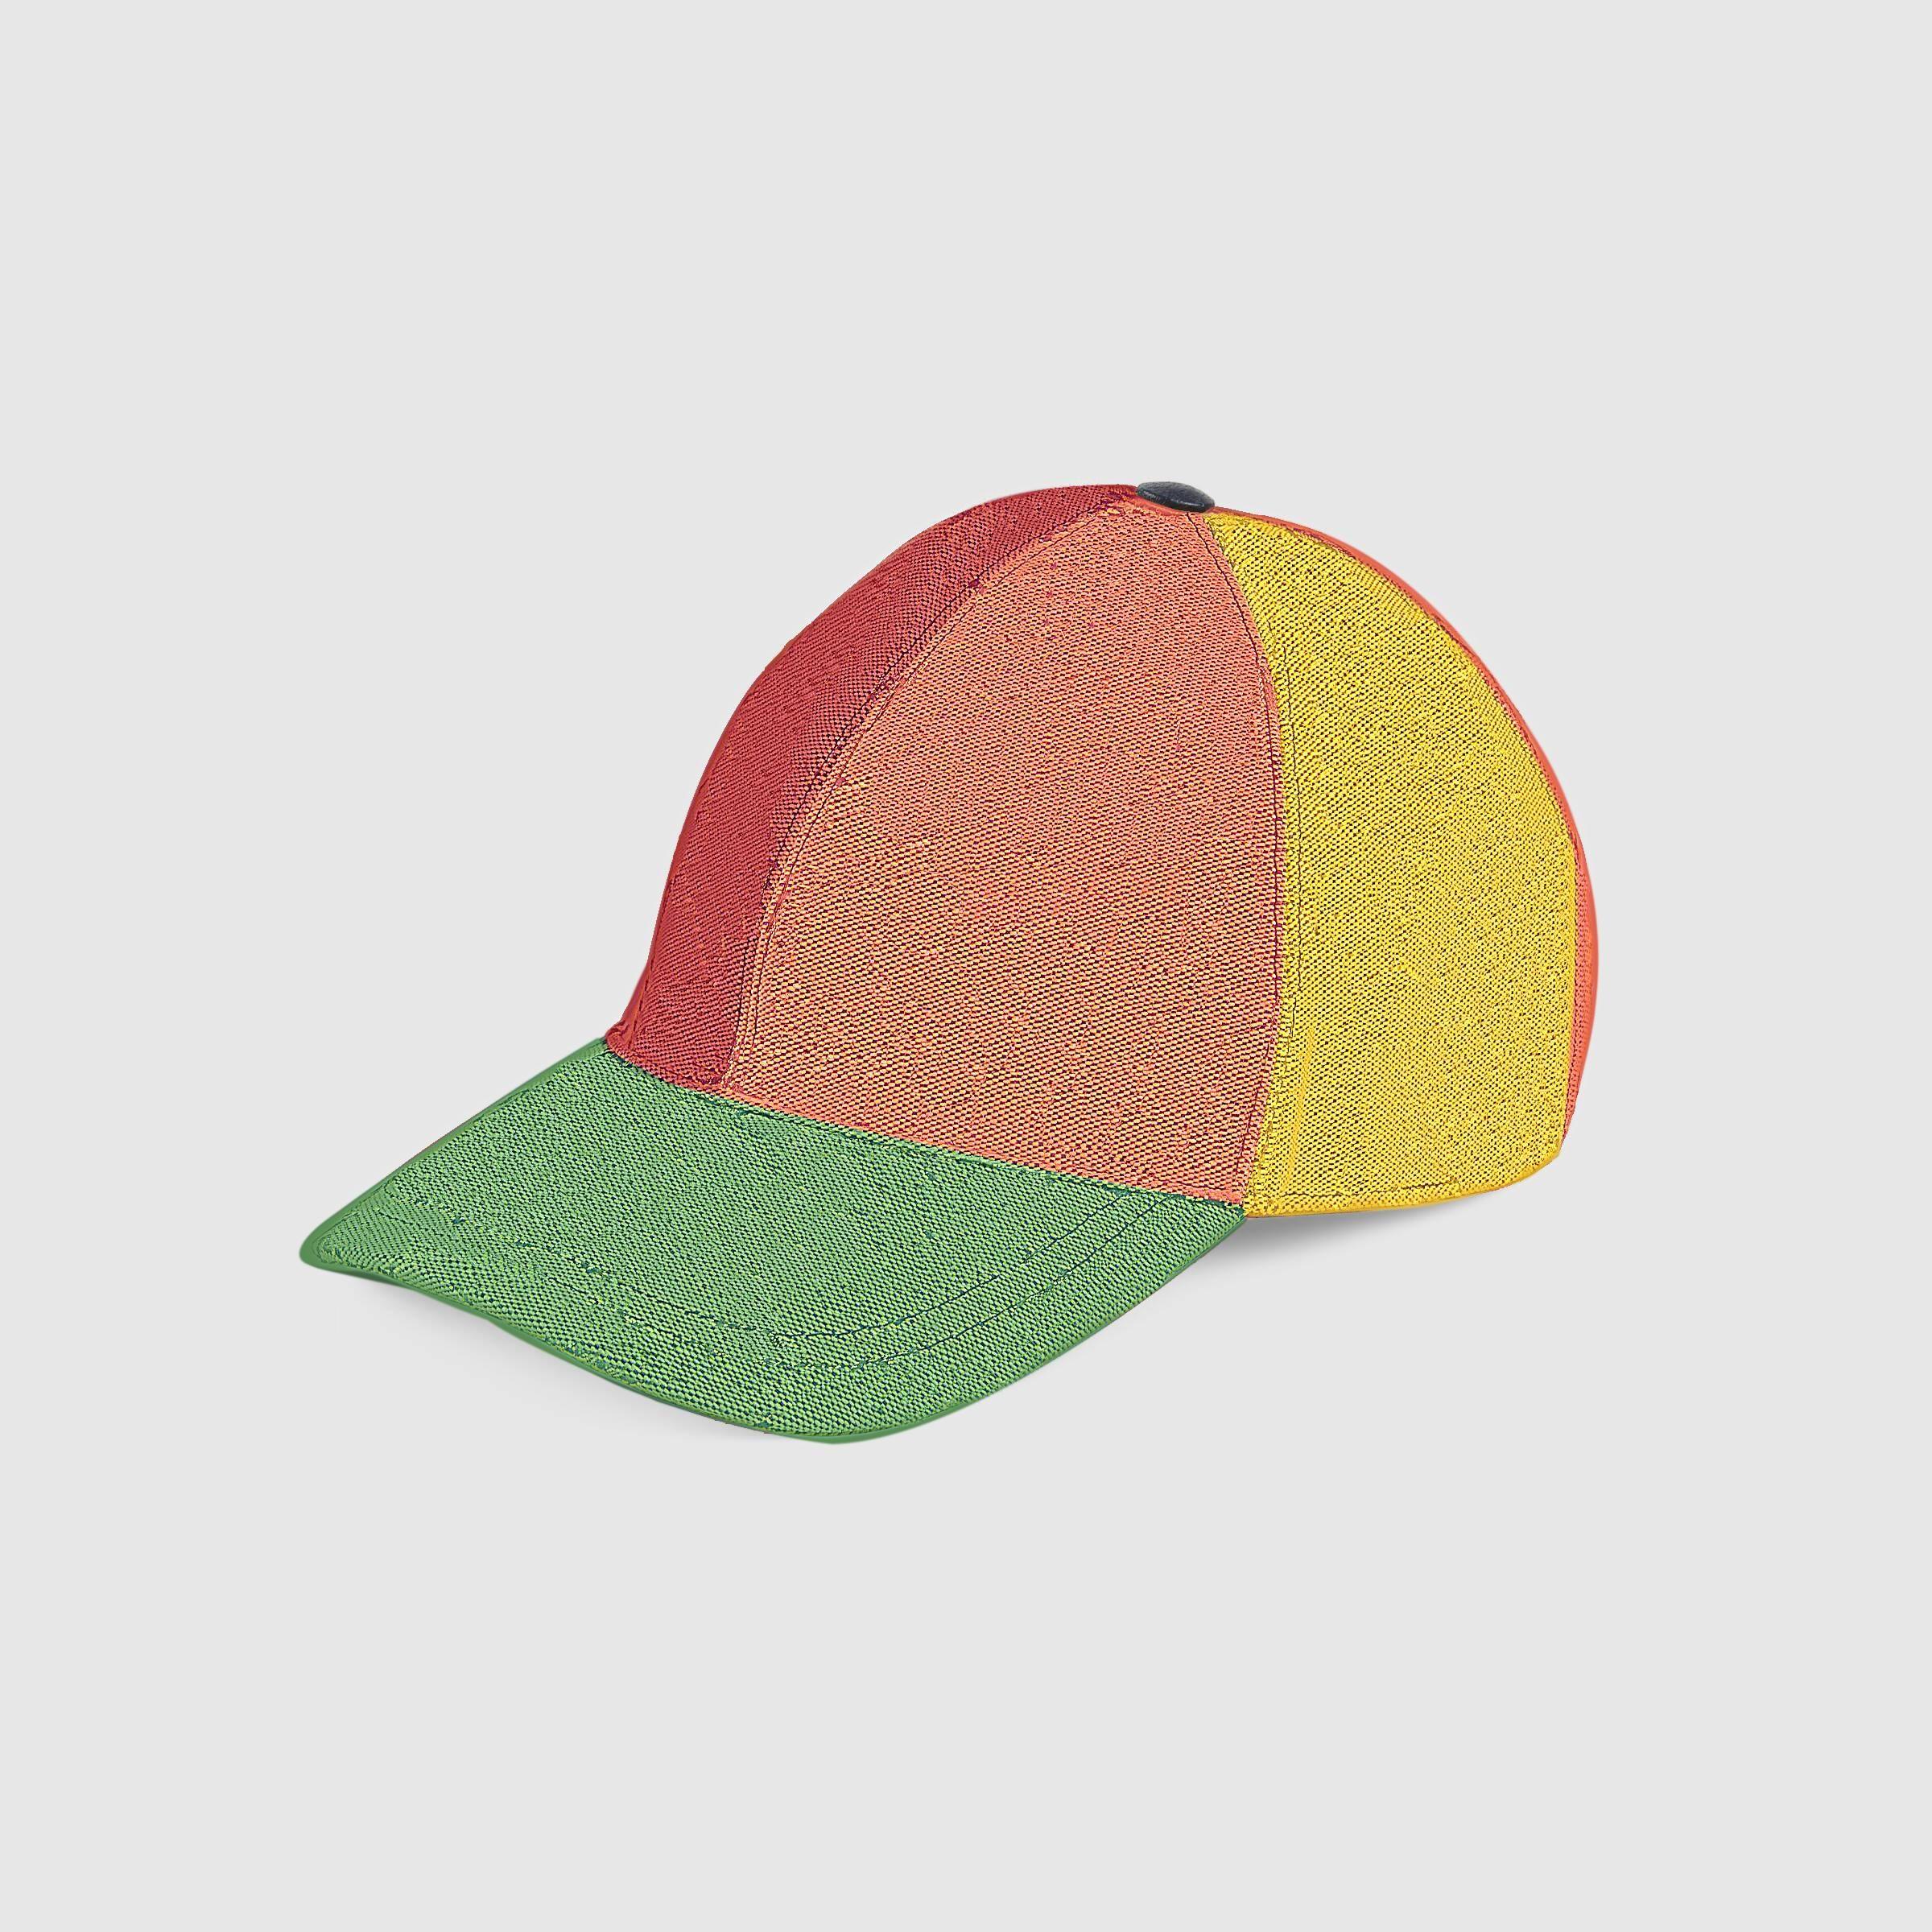 Cubo Classic Sombreros Teneral Trimible Tolera de Béisbol Sun Playa Gorra para Hombres Mujer Snapbacks Ball Caps Verano Mesh Fit Hat Patchwork Fashion Icon Visor Fascinator Hatss Boxss